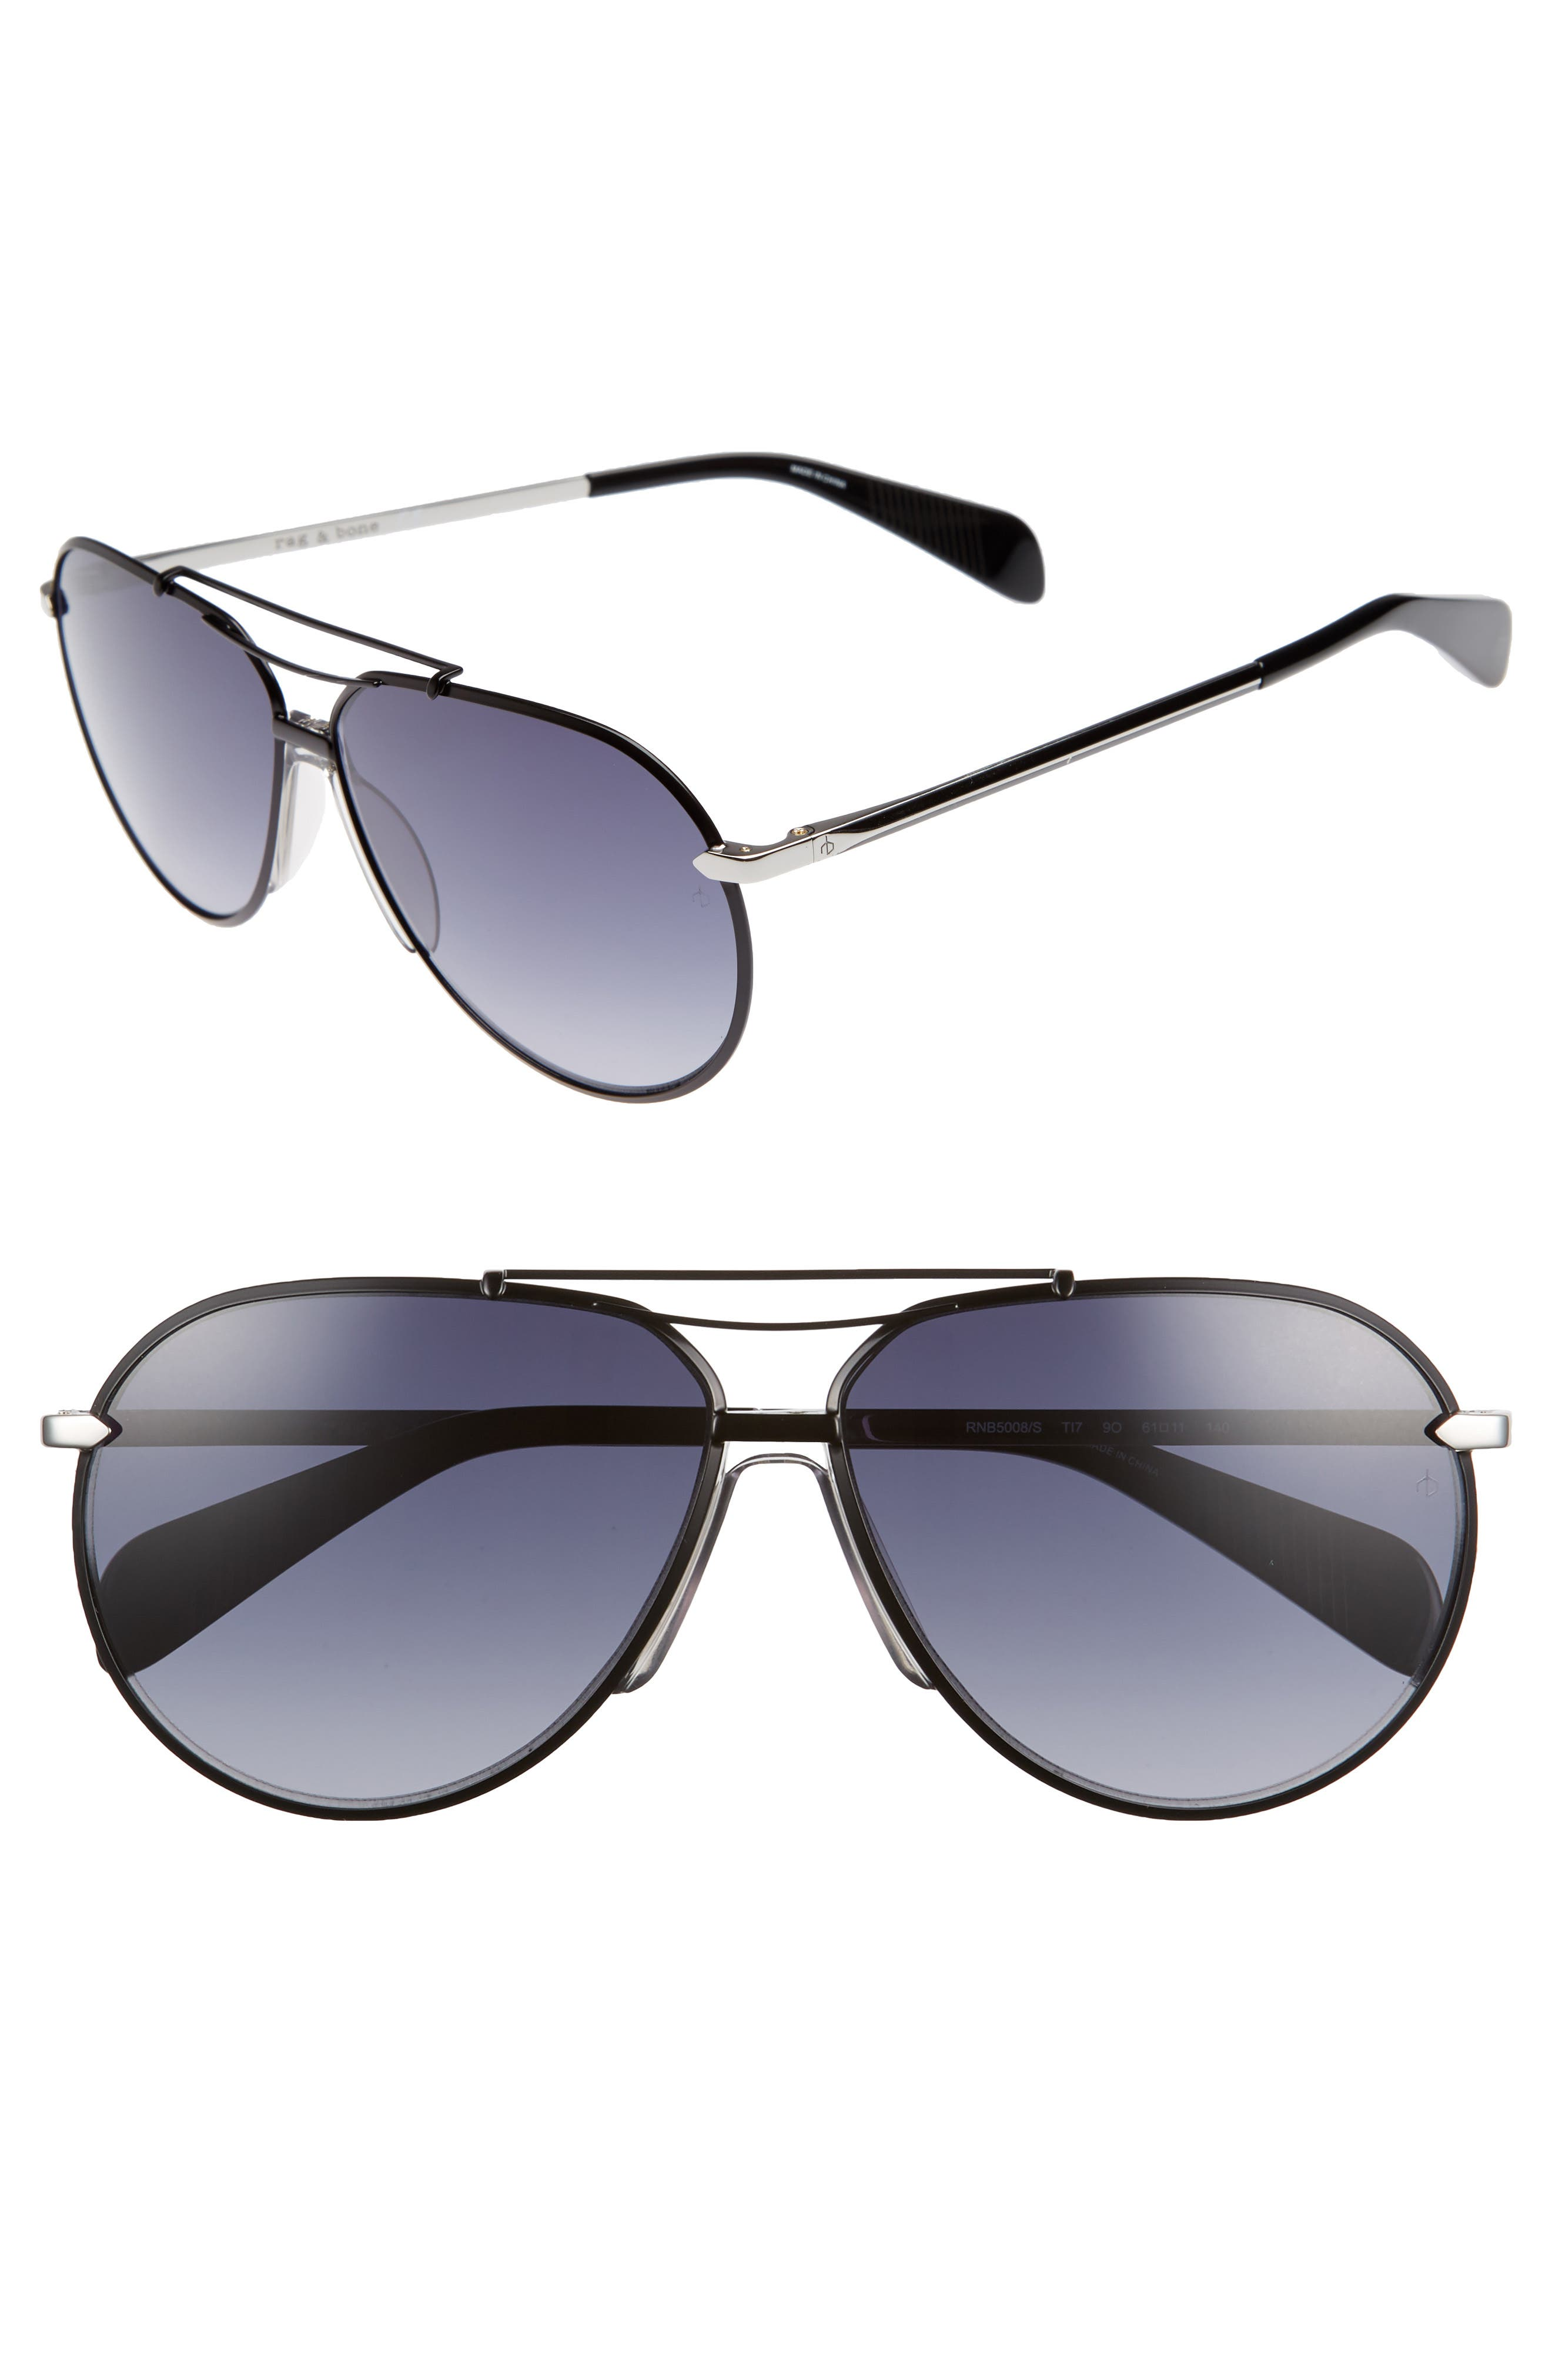 61mm Aviator Gradient Sunglasses,                             Main thumbnail 1, color,                             RUTHENIUM/ MATTE BLACK